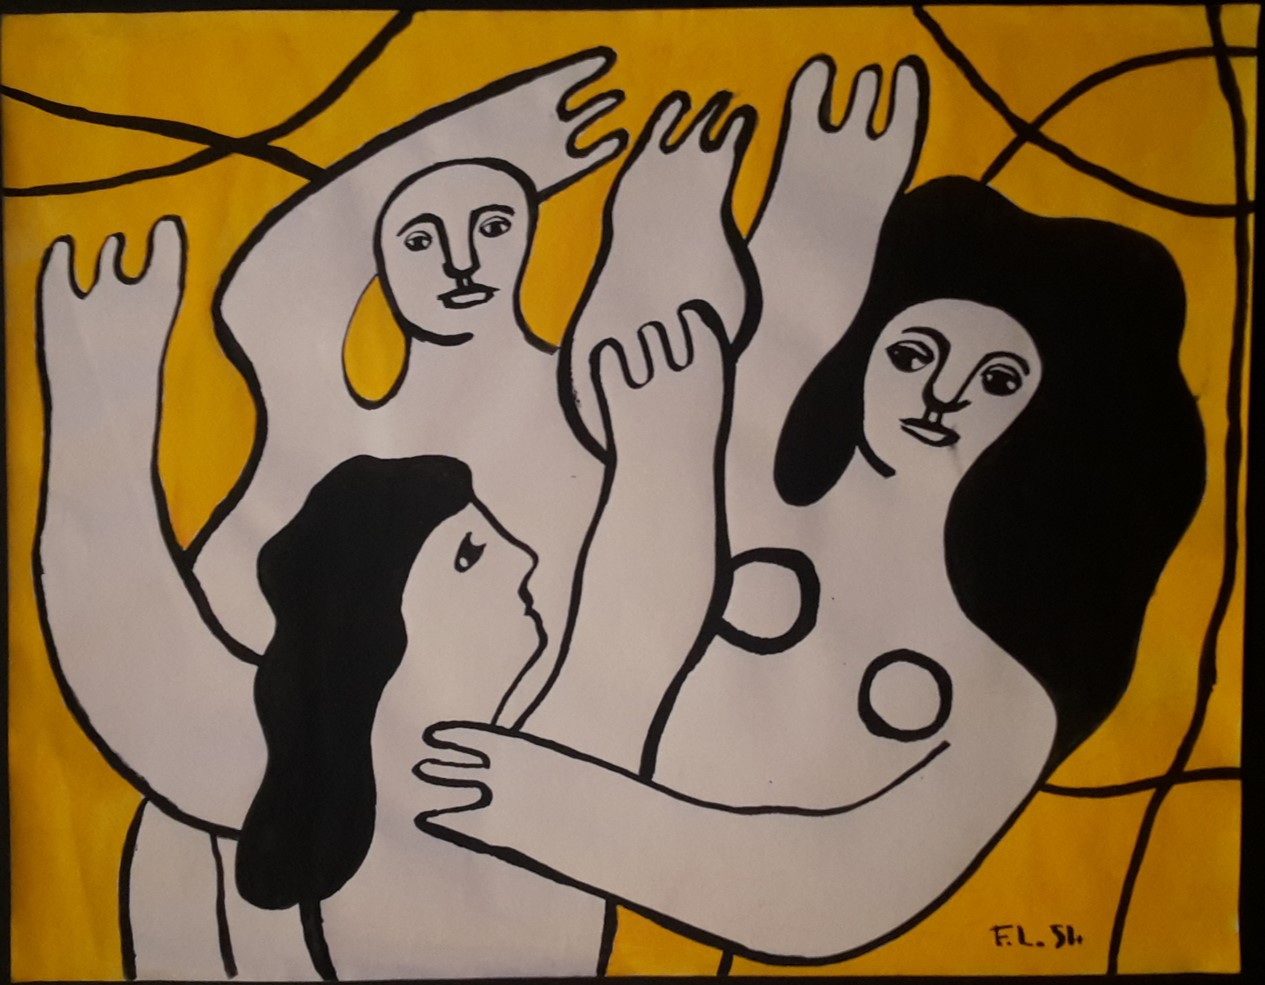 Fernand Léger- Sao Paulo fond jaune 1954 Gouache sur papier 29,5 x 37,5 cm Coll. part.